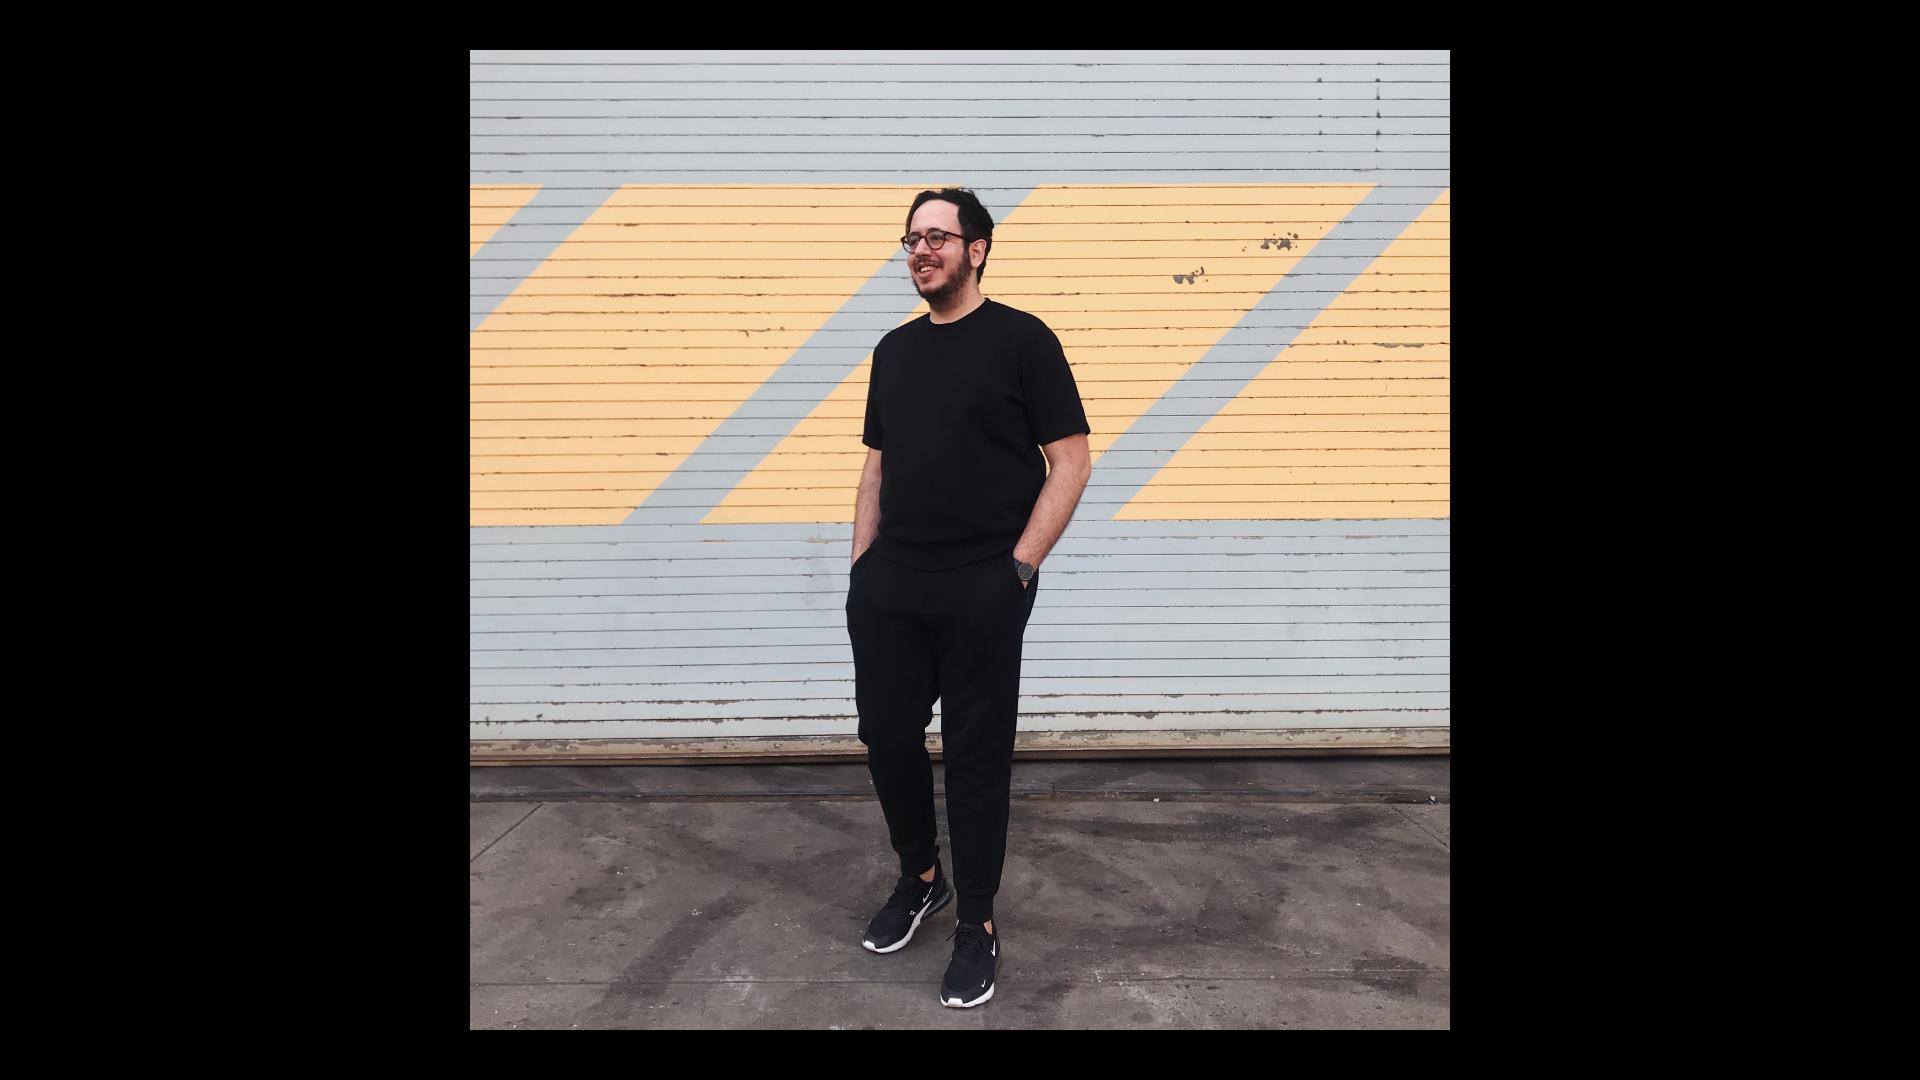 Sabri Akin posing in black clothes and black glasses